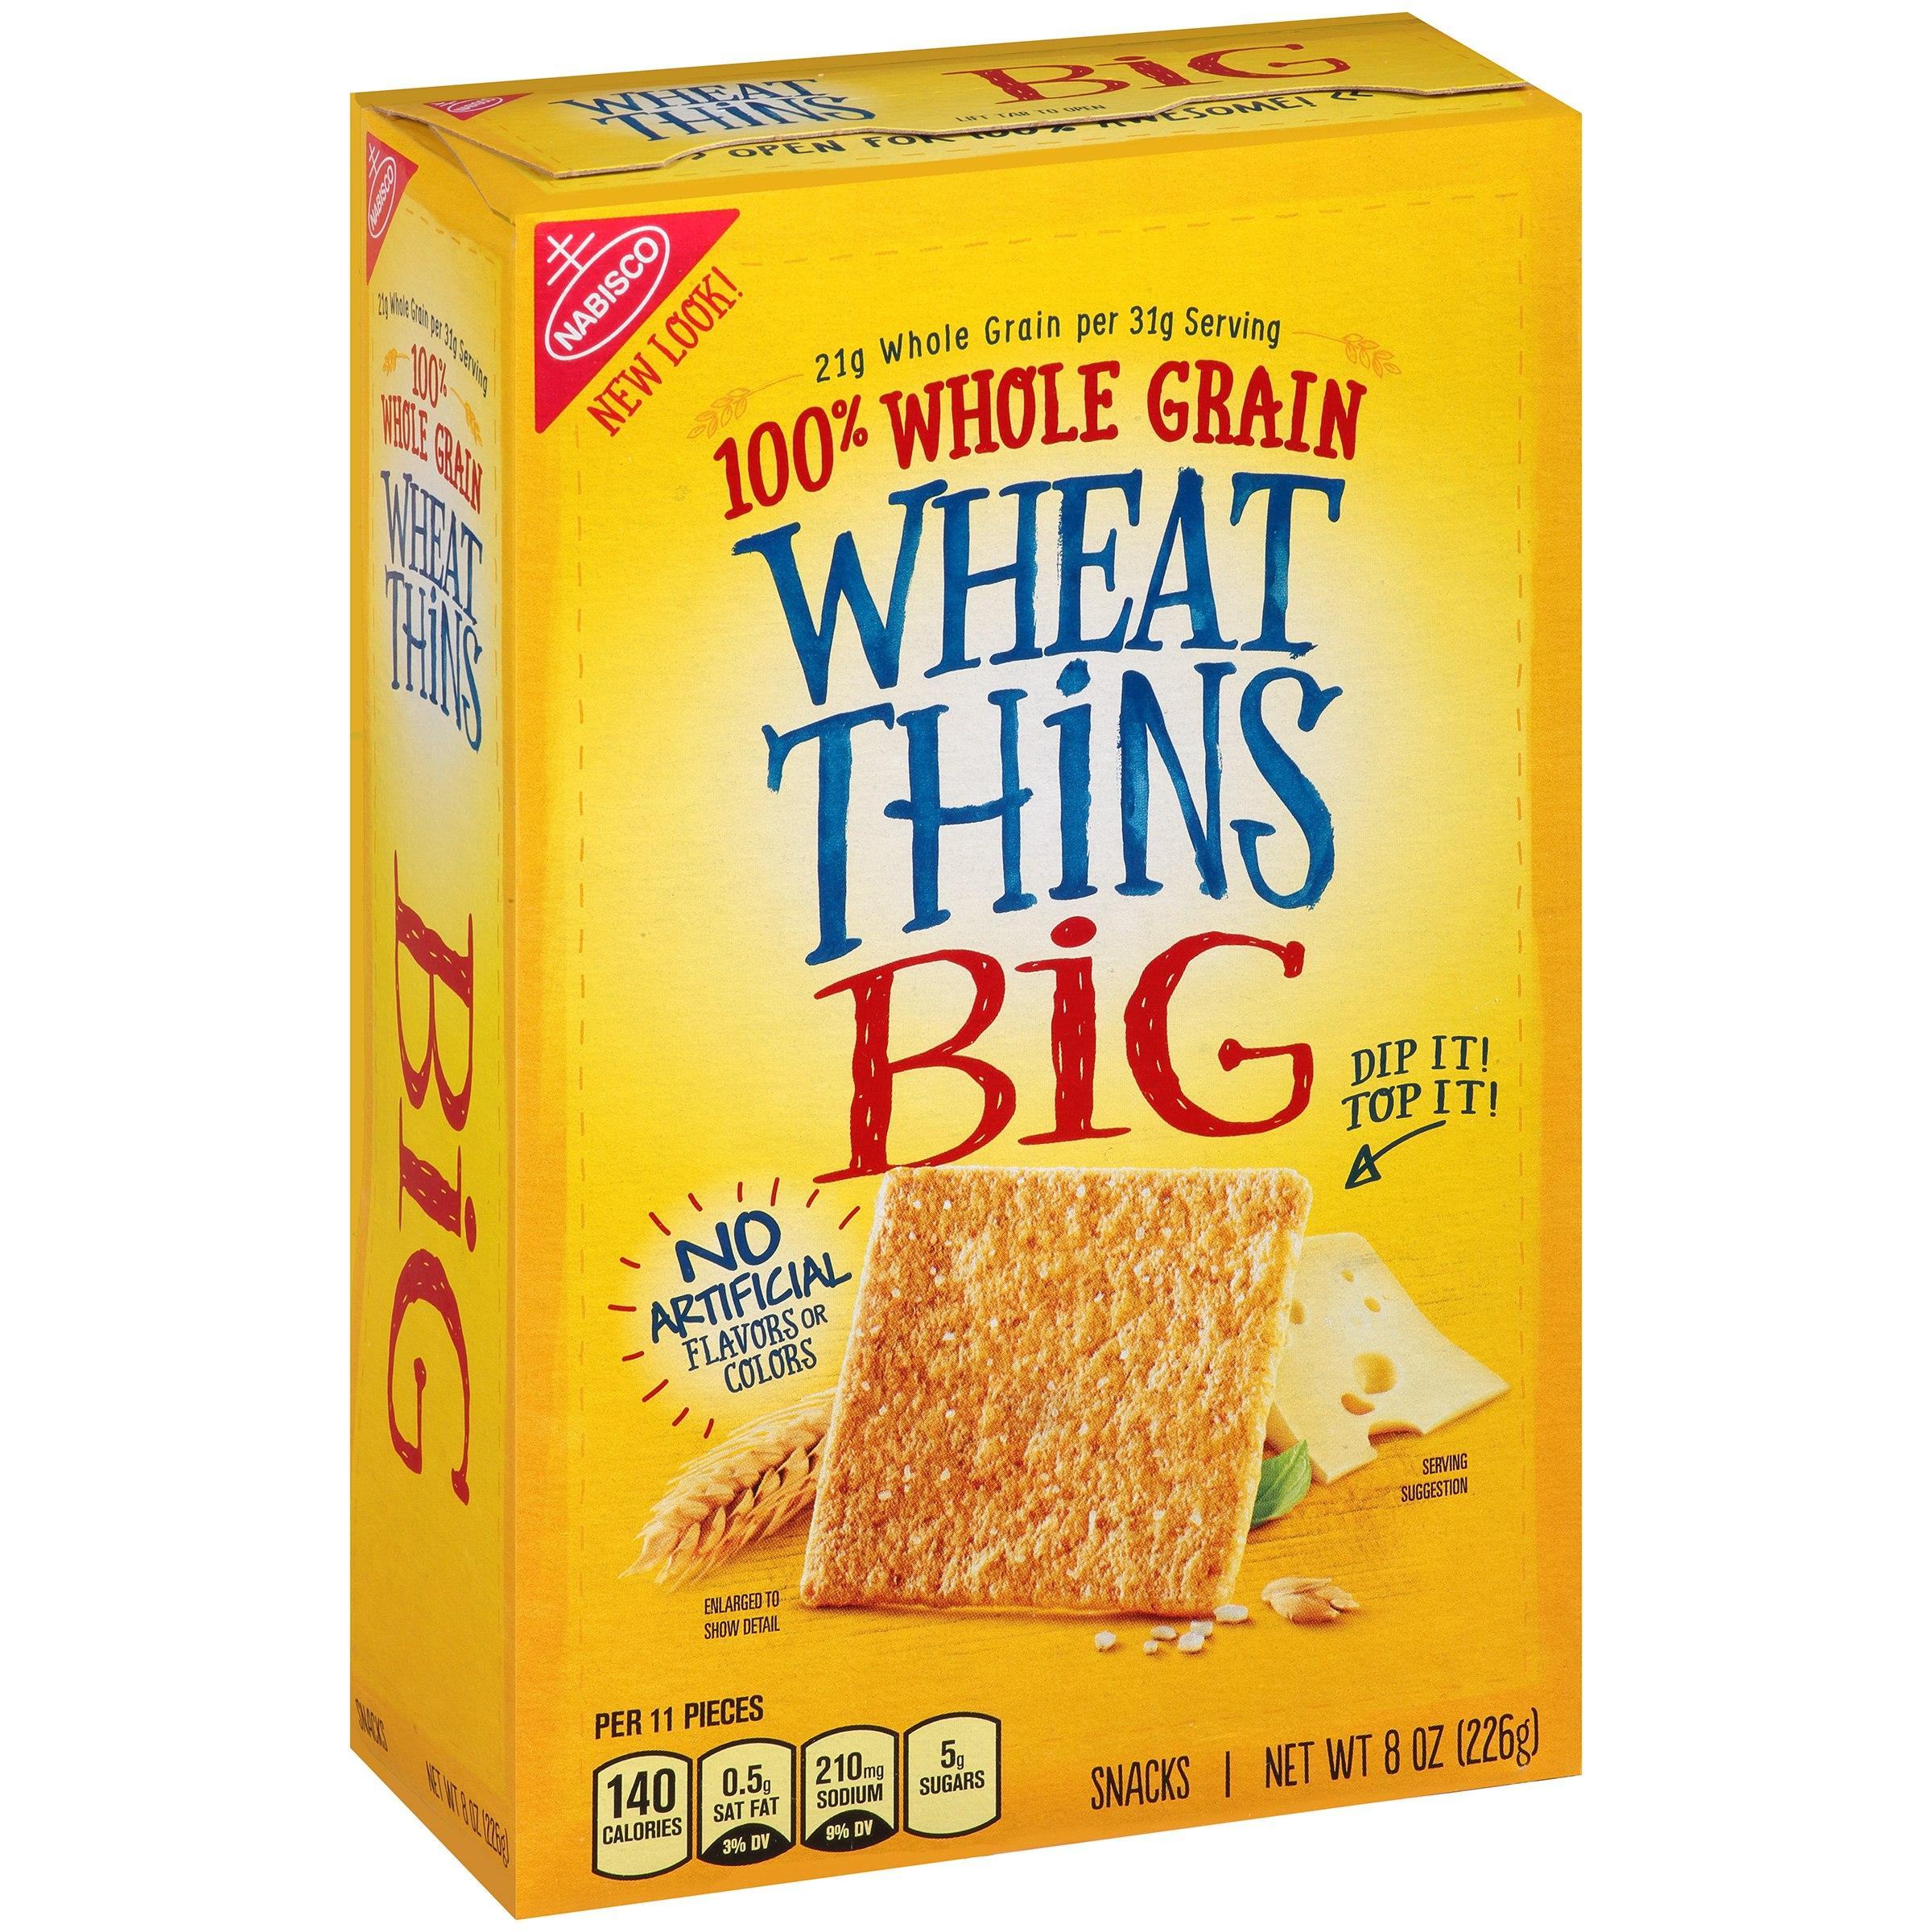 Mondelez Global Llc Nabisco Big Top Wheat Thins Snacks, 8.0 Oz